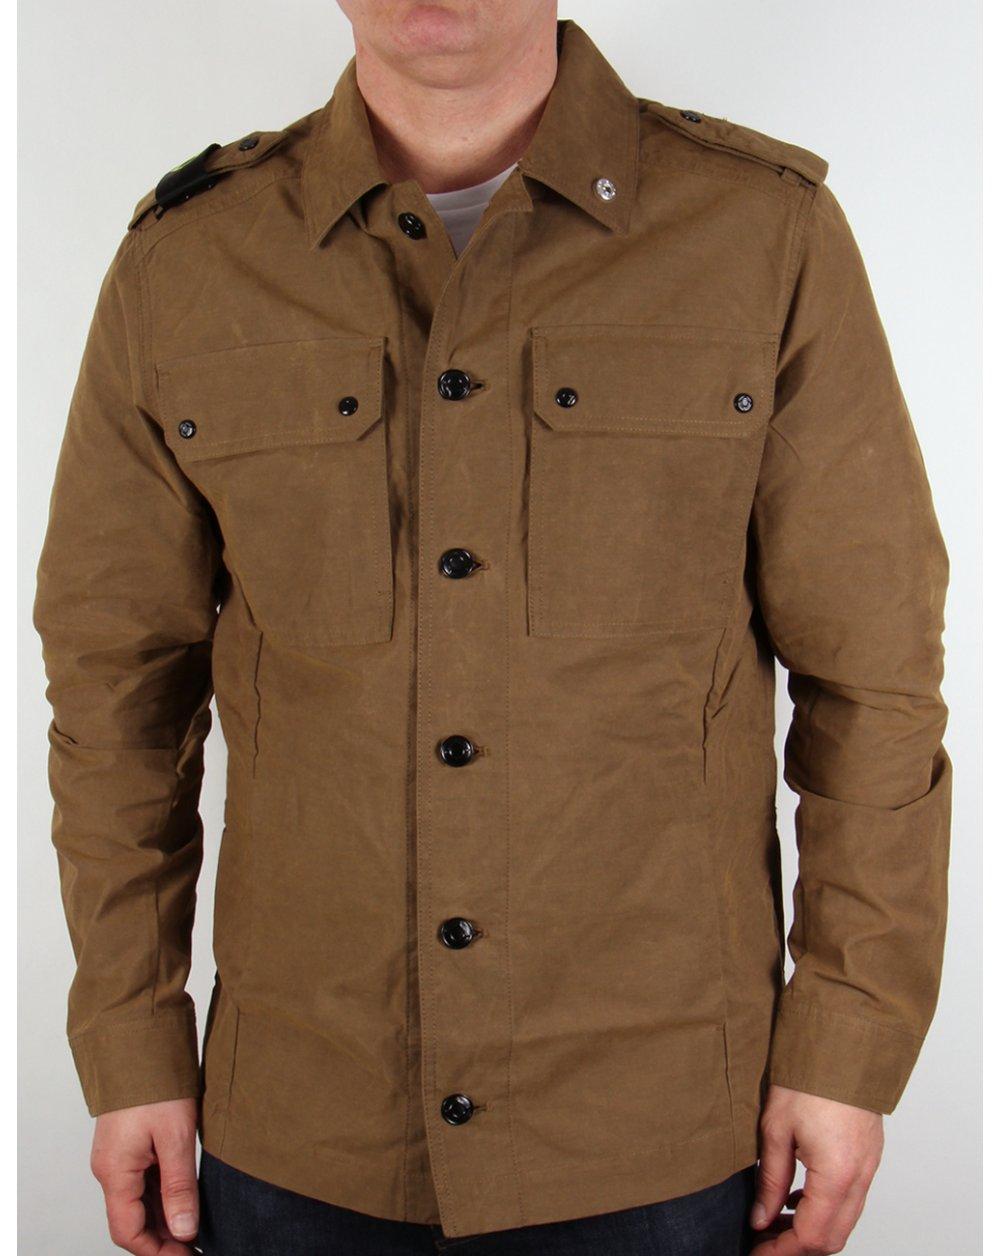 Ma Strum Overshirt British Khaki Jacket Coat Terrace Mens